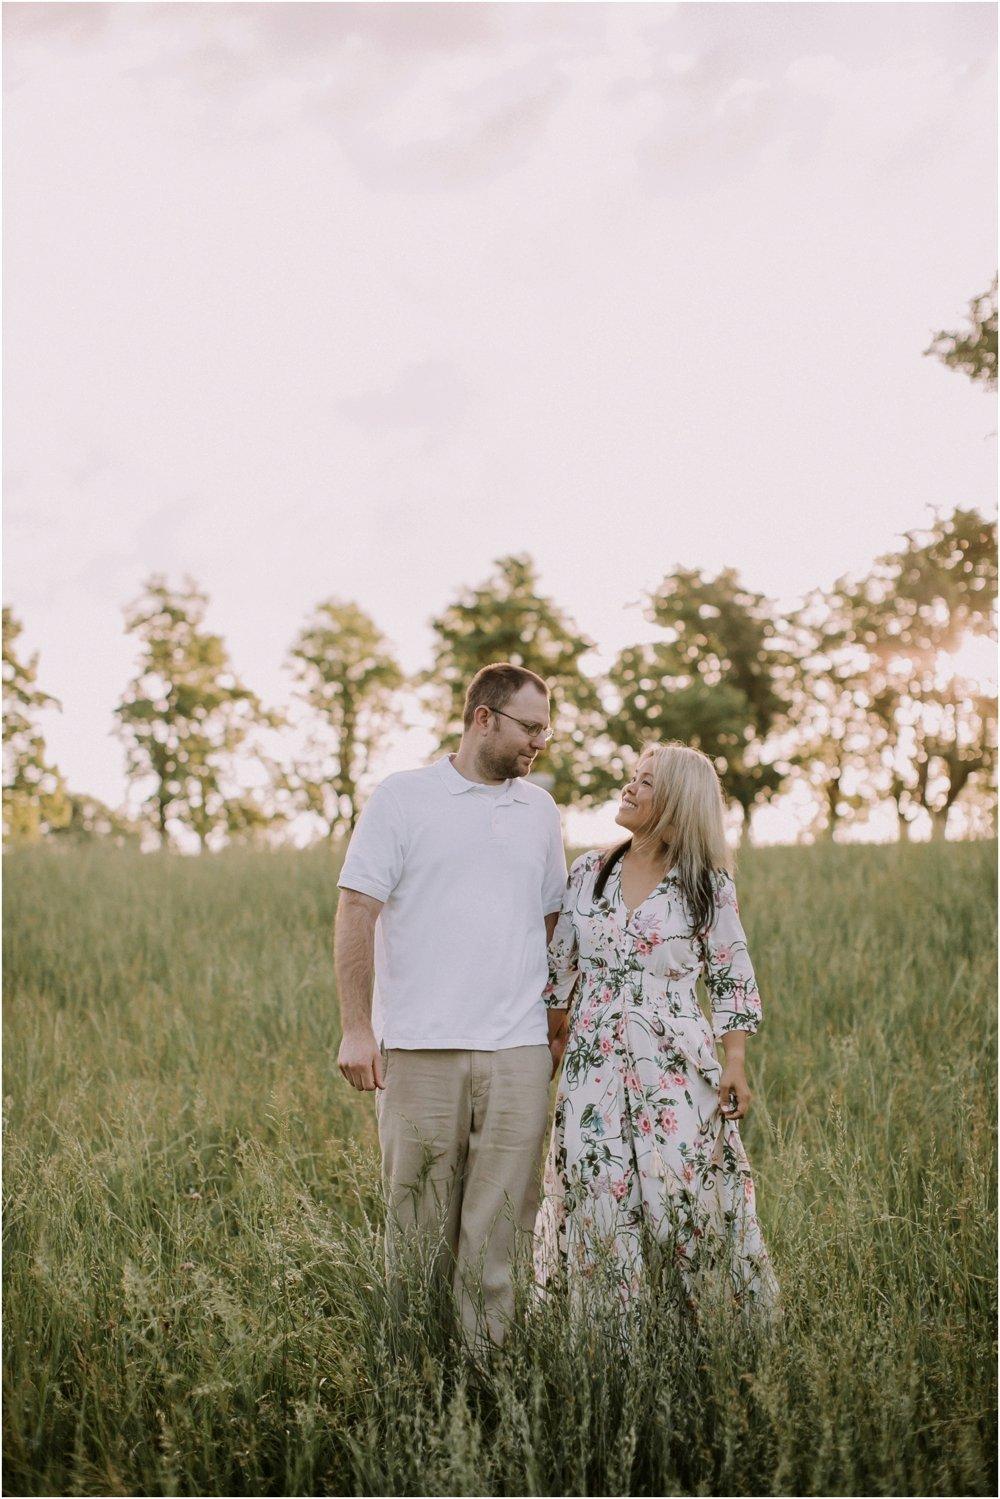 ten year wedding anniversary photography at shawnee mission park